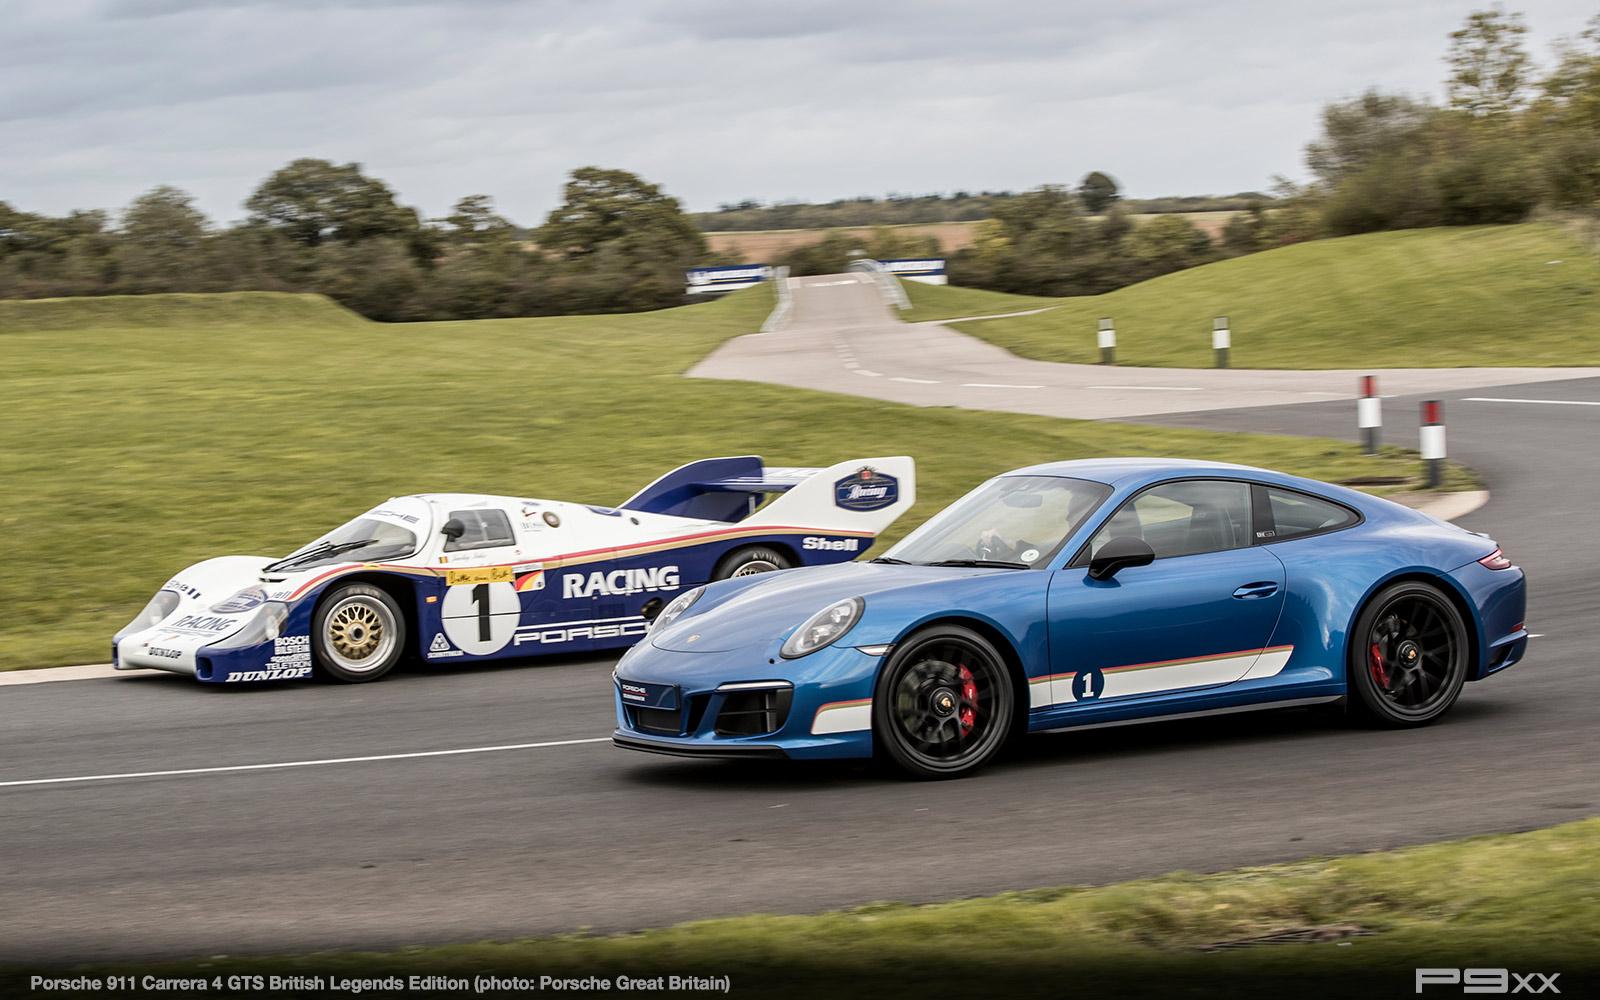 Porsche-911-Carrera-4-GTS-British-Legends-Edition-378